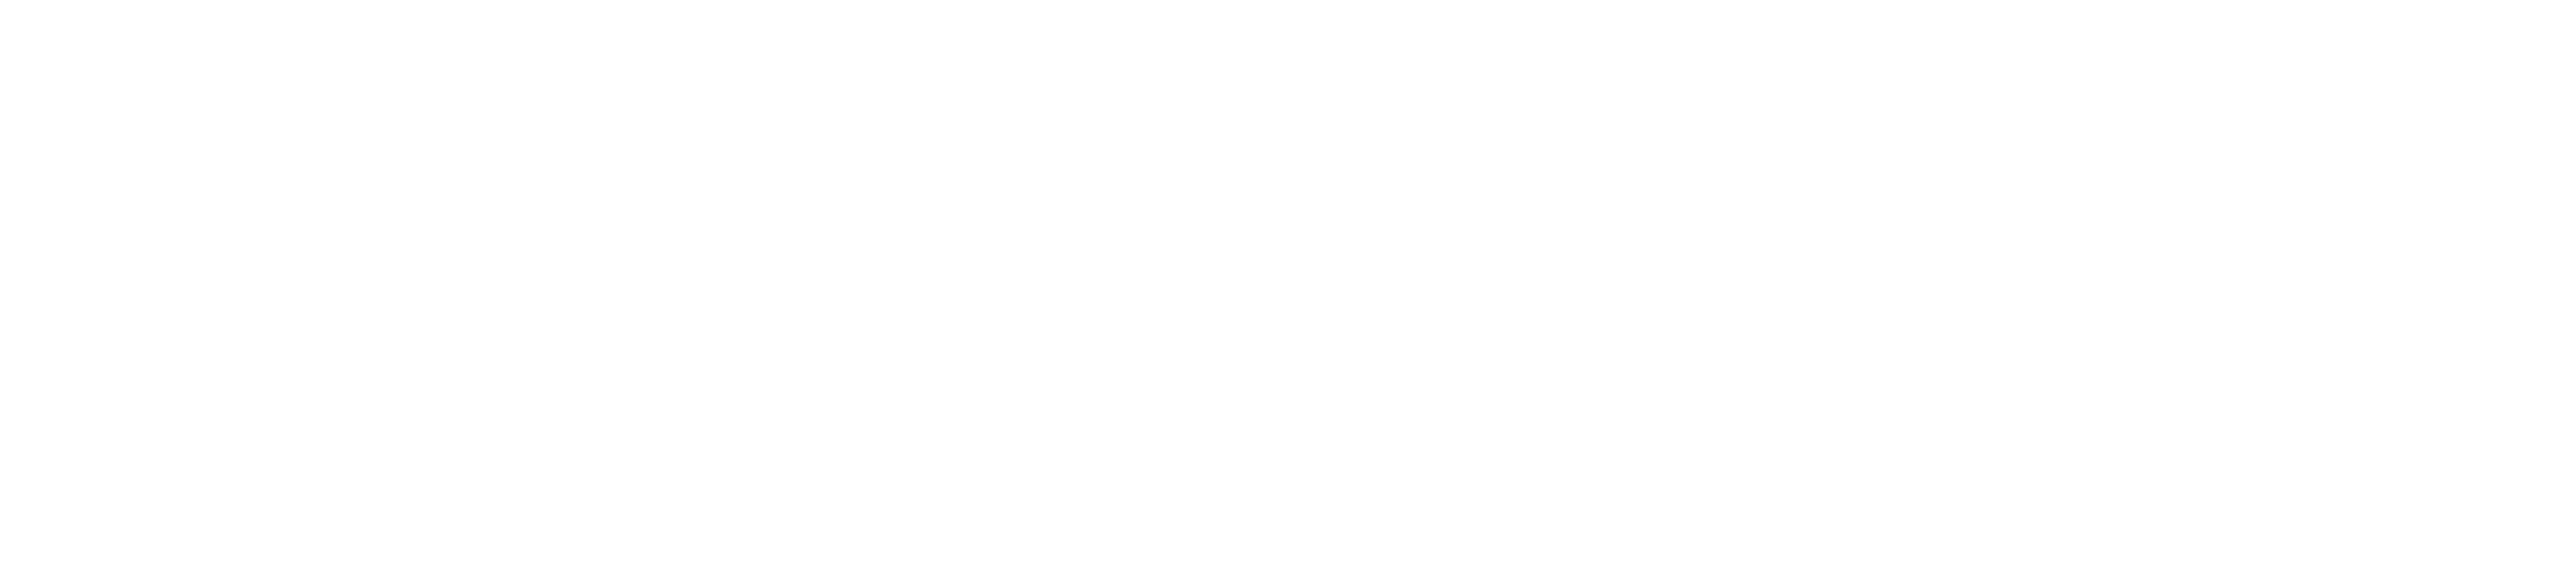 TurboTap